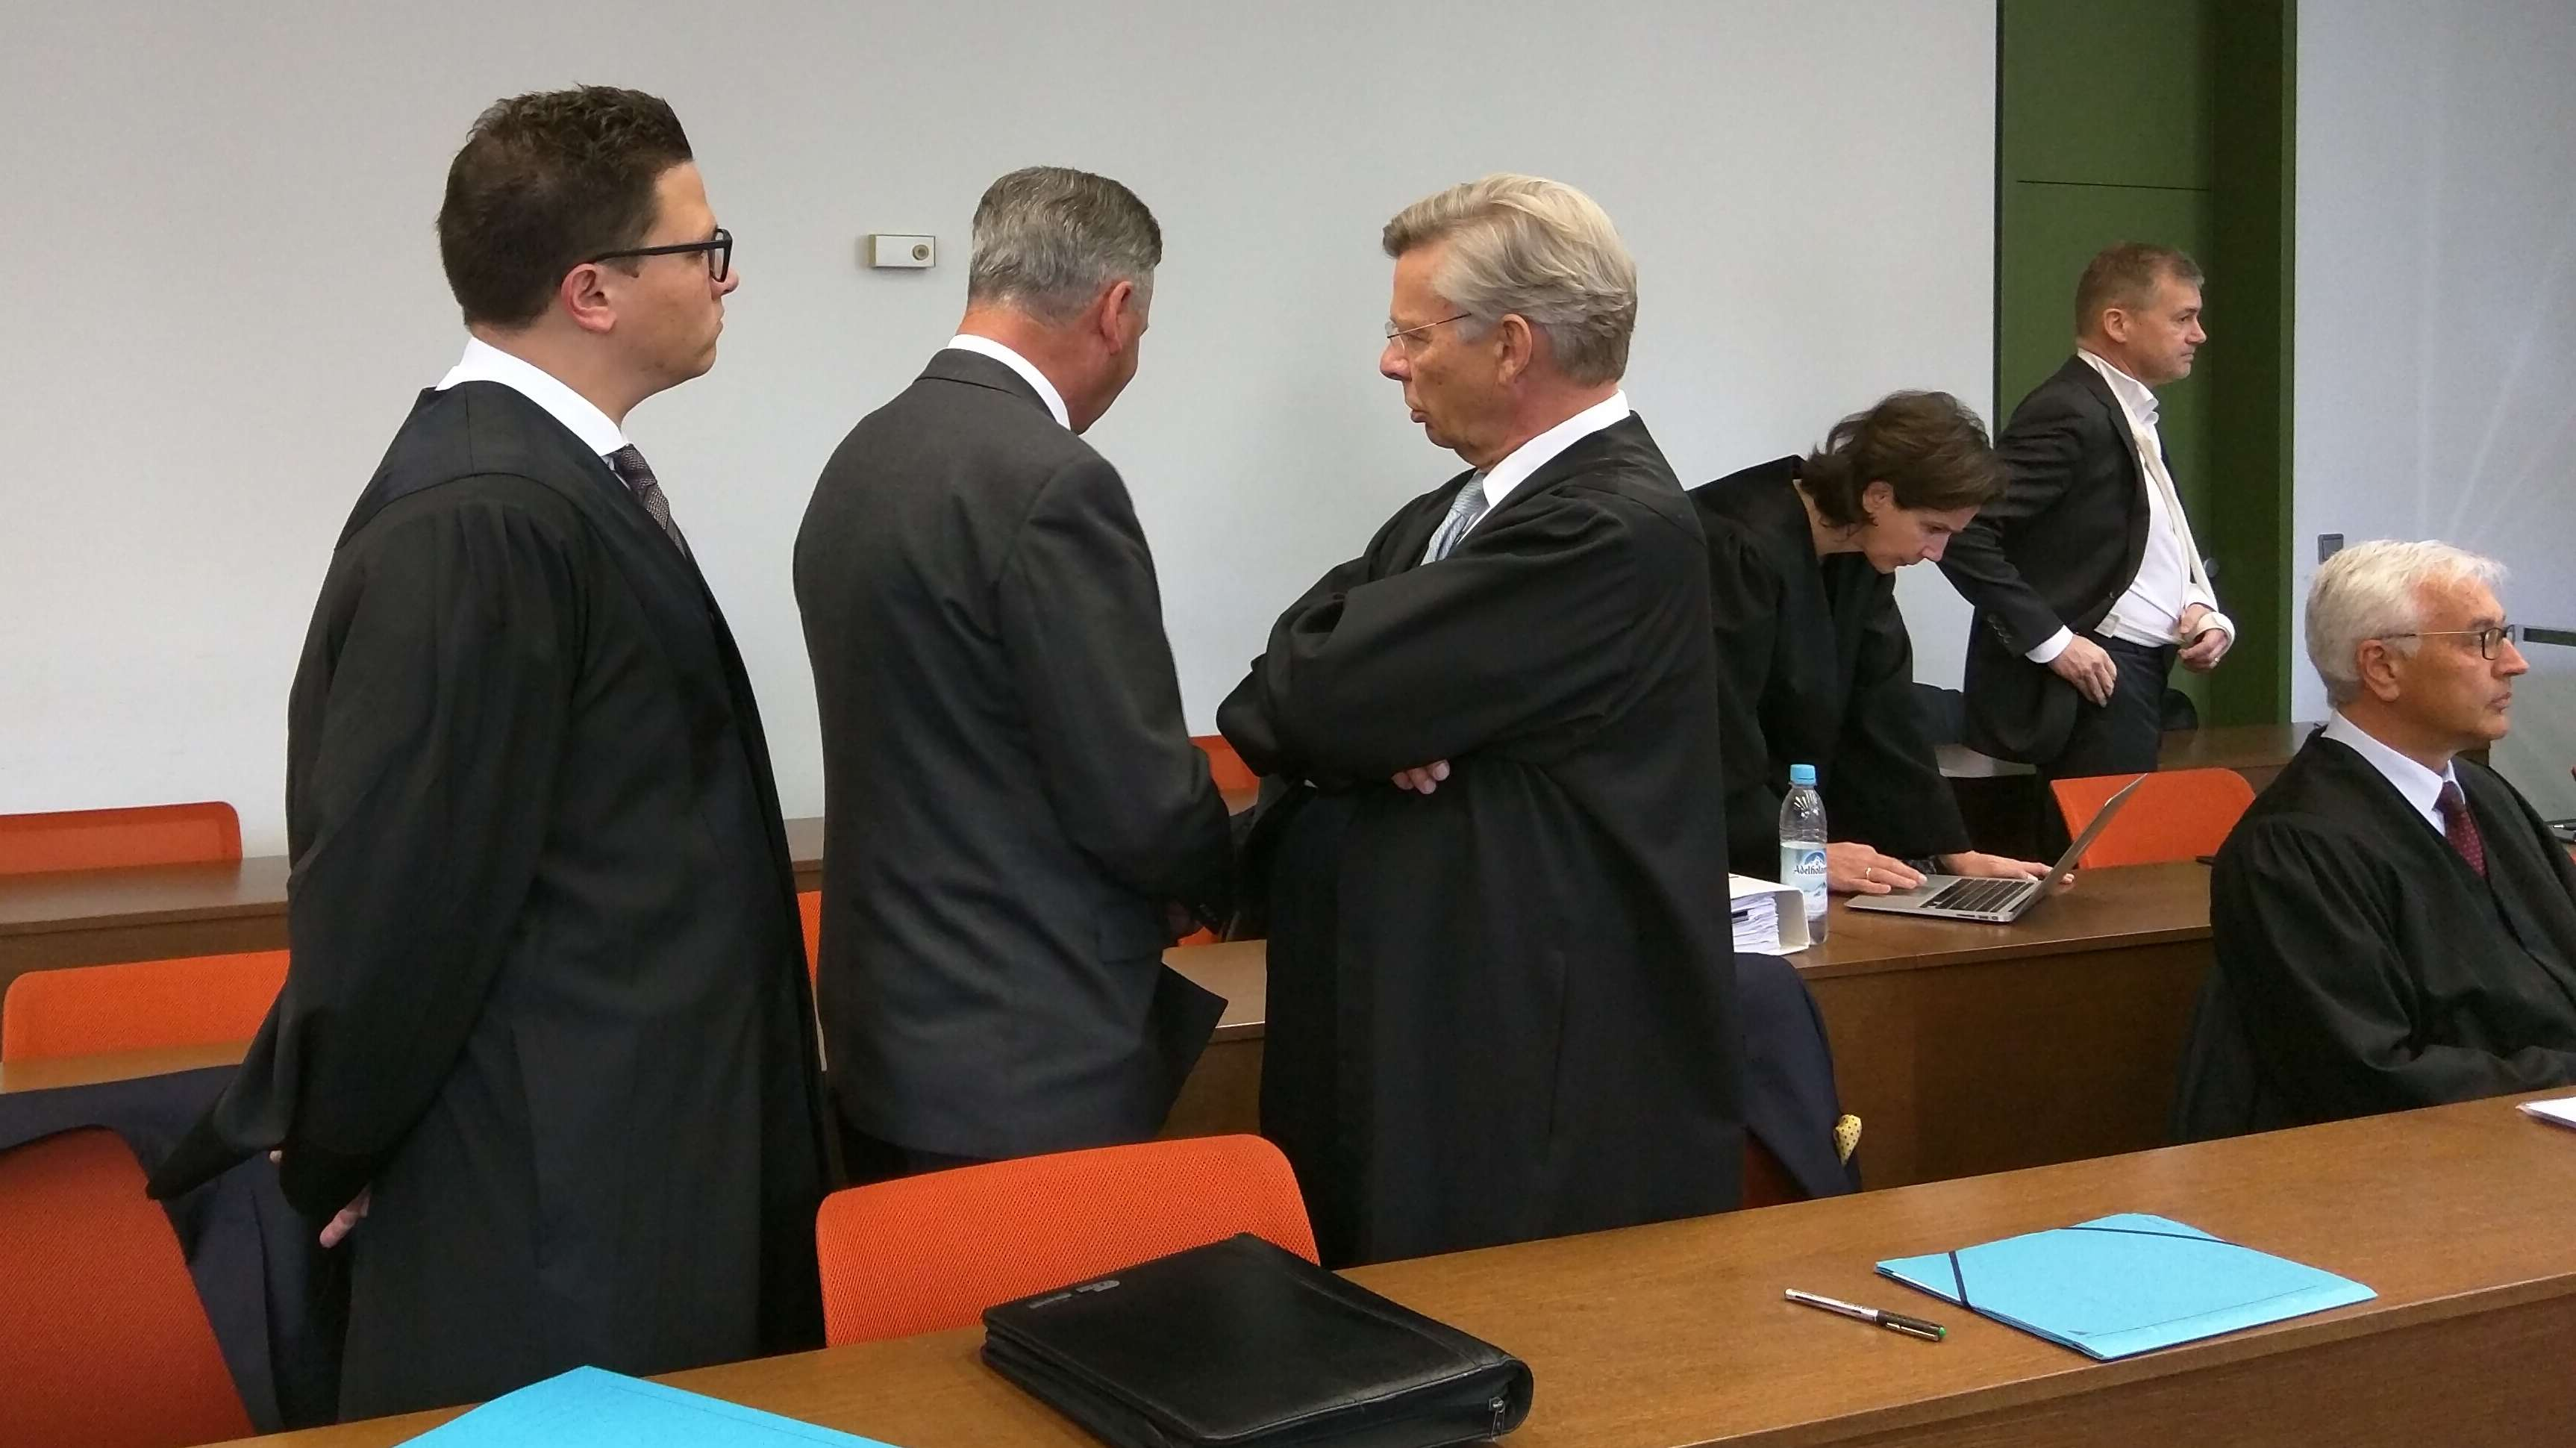 Besprechung im Prozess um die Miesbacher Sparkassen-Affäre.